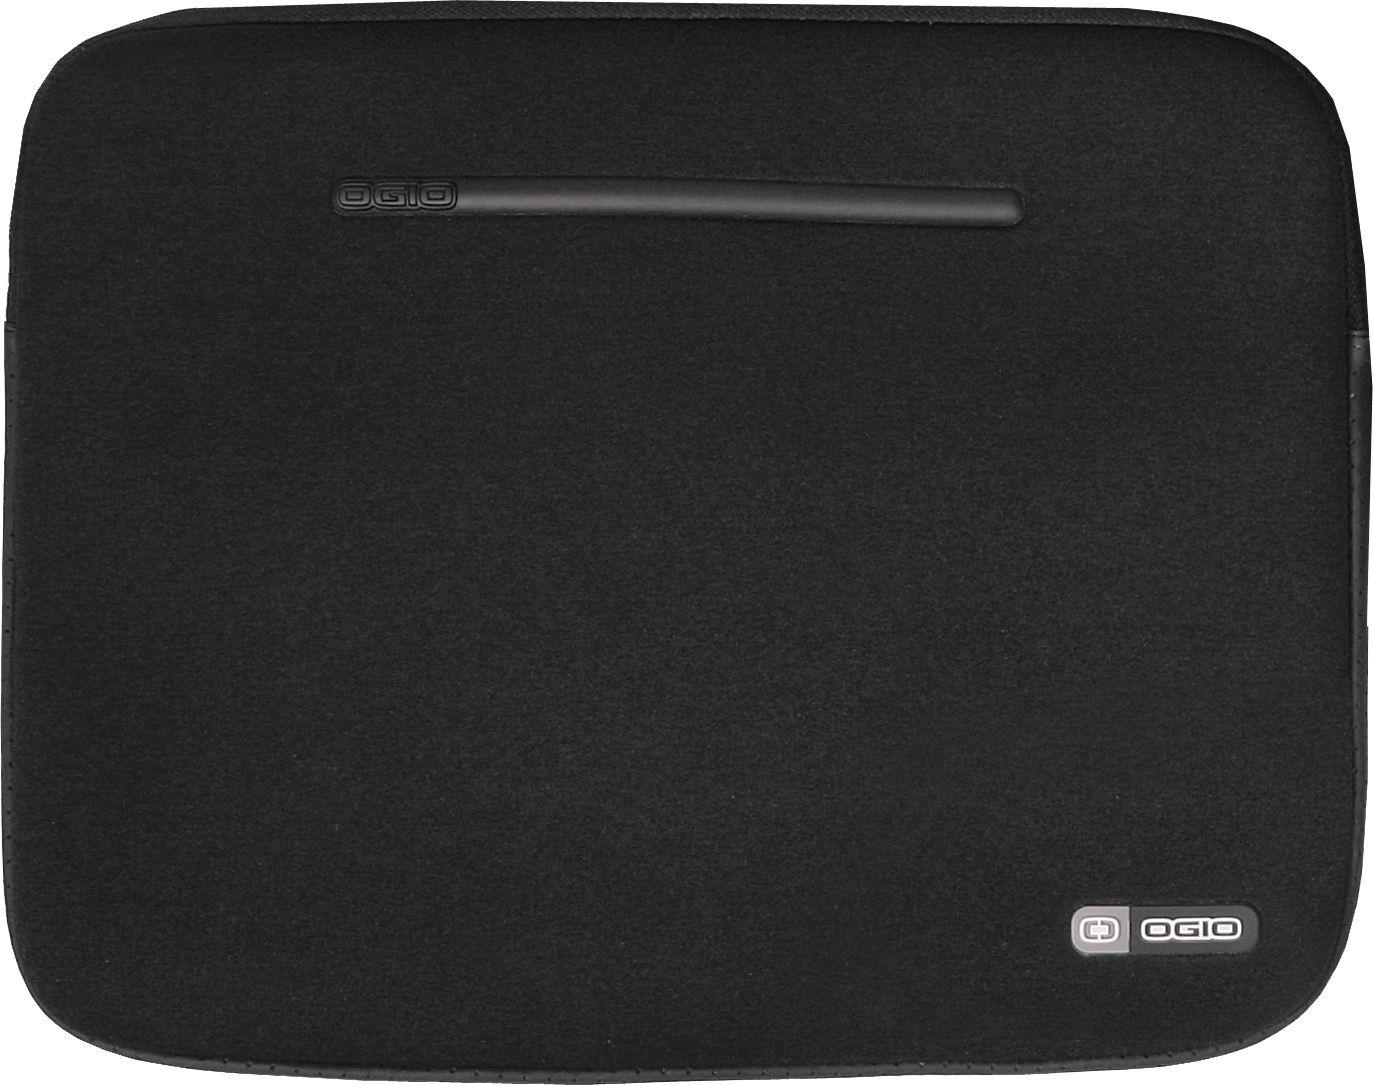 Ogio 17inch Neoprene Laptop Sleeve | Travel bags